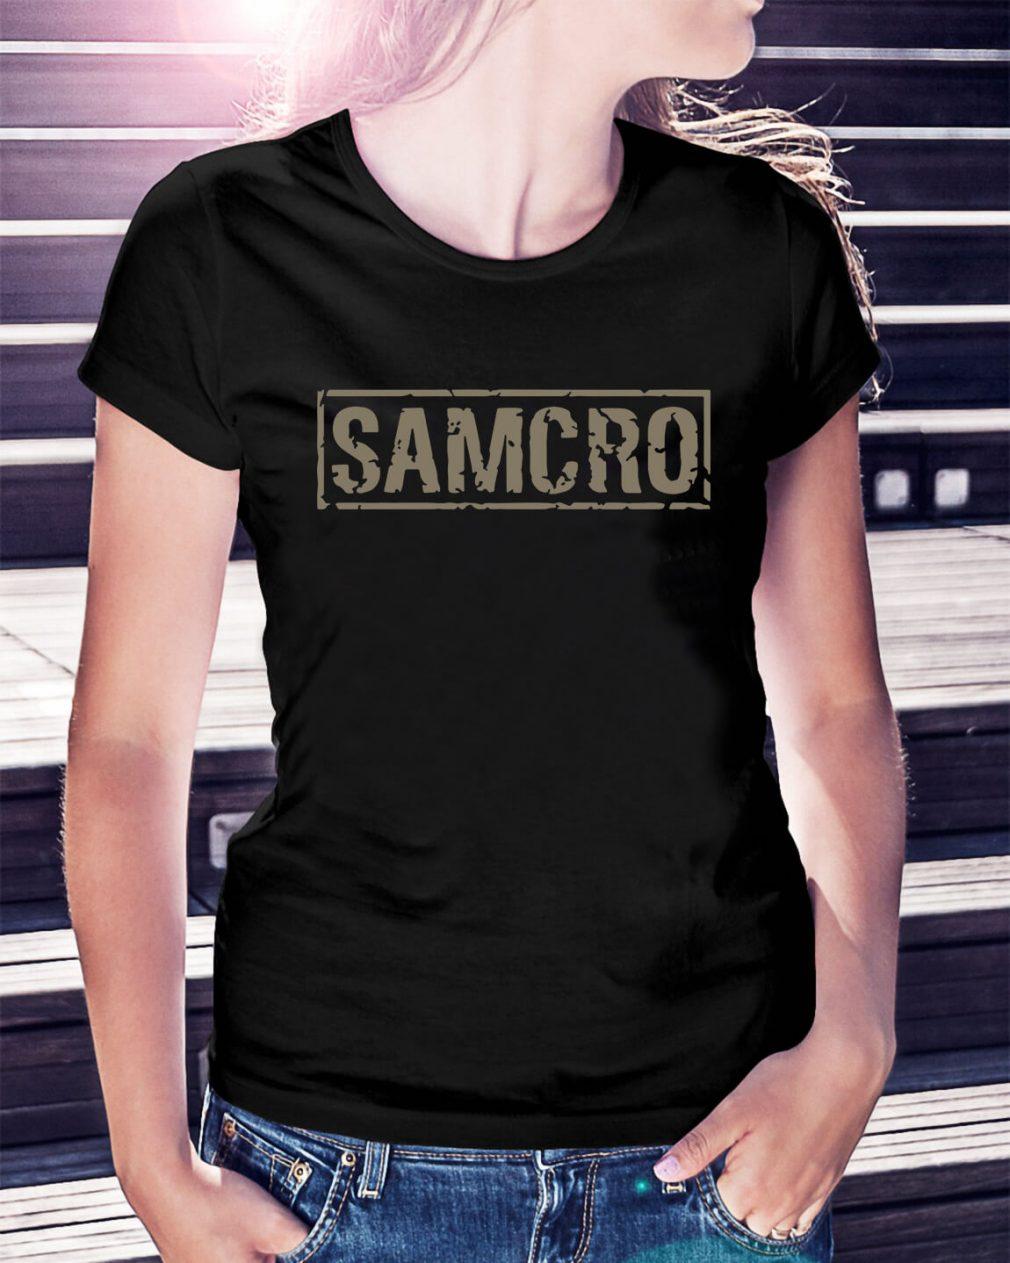 Sons of Anarchy Samcro Ladies Tee